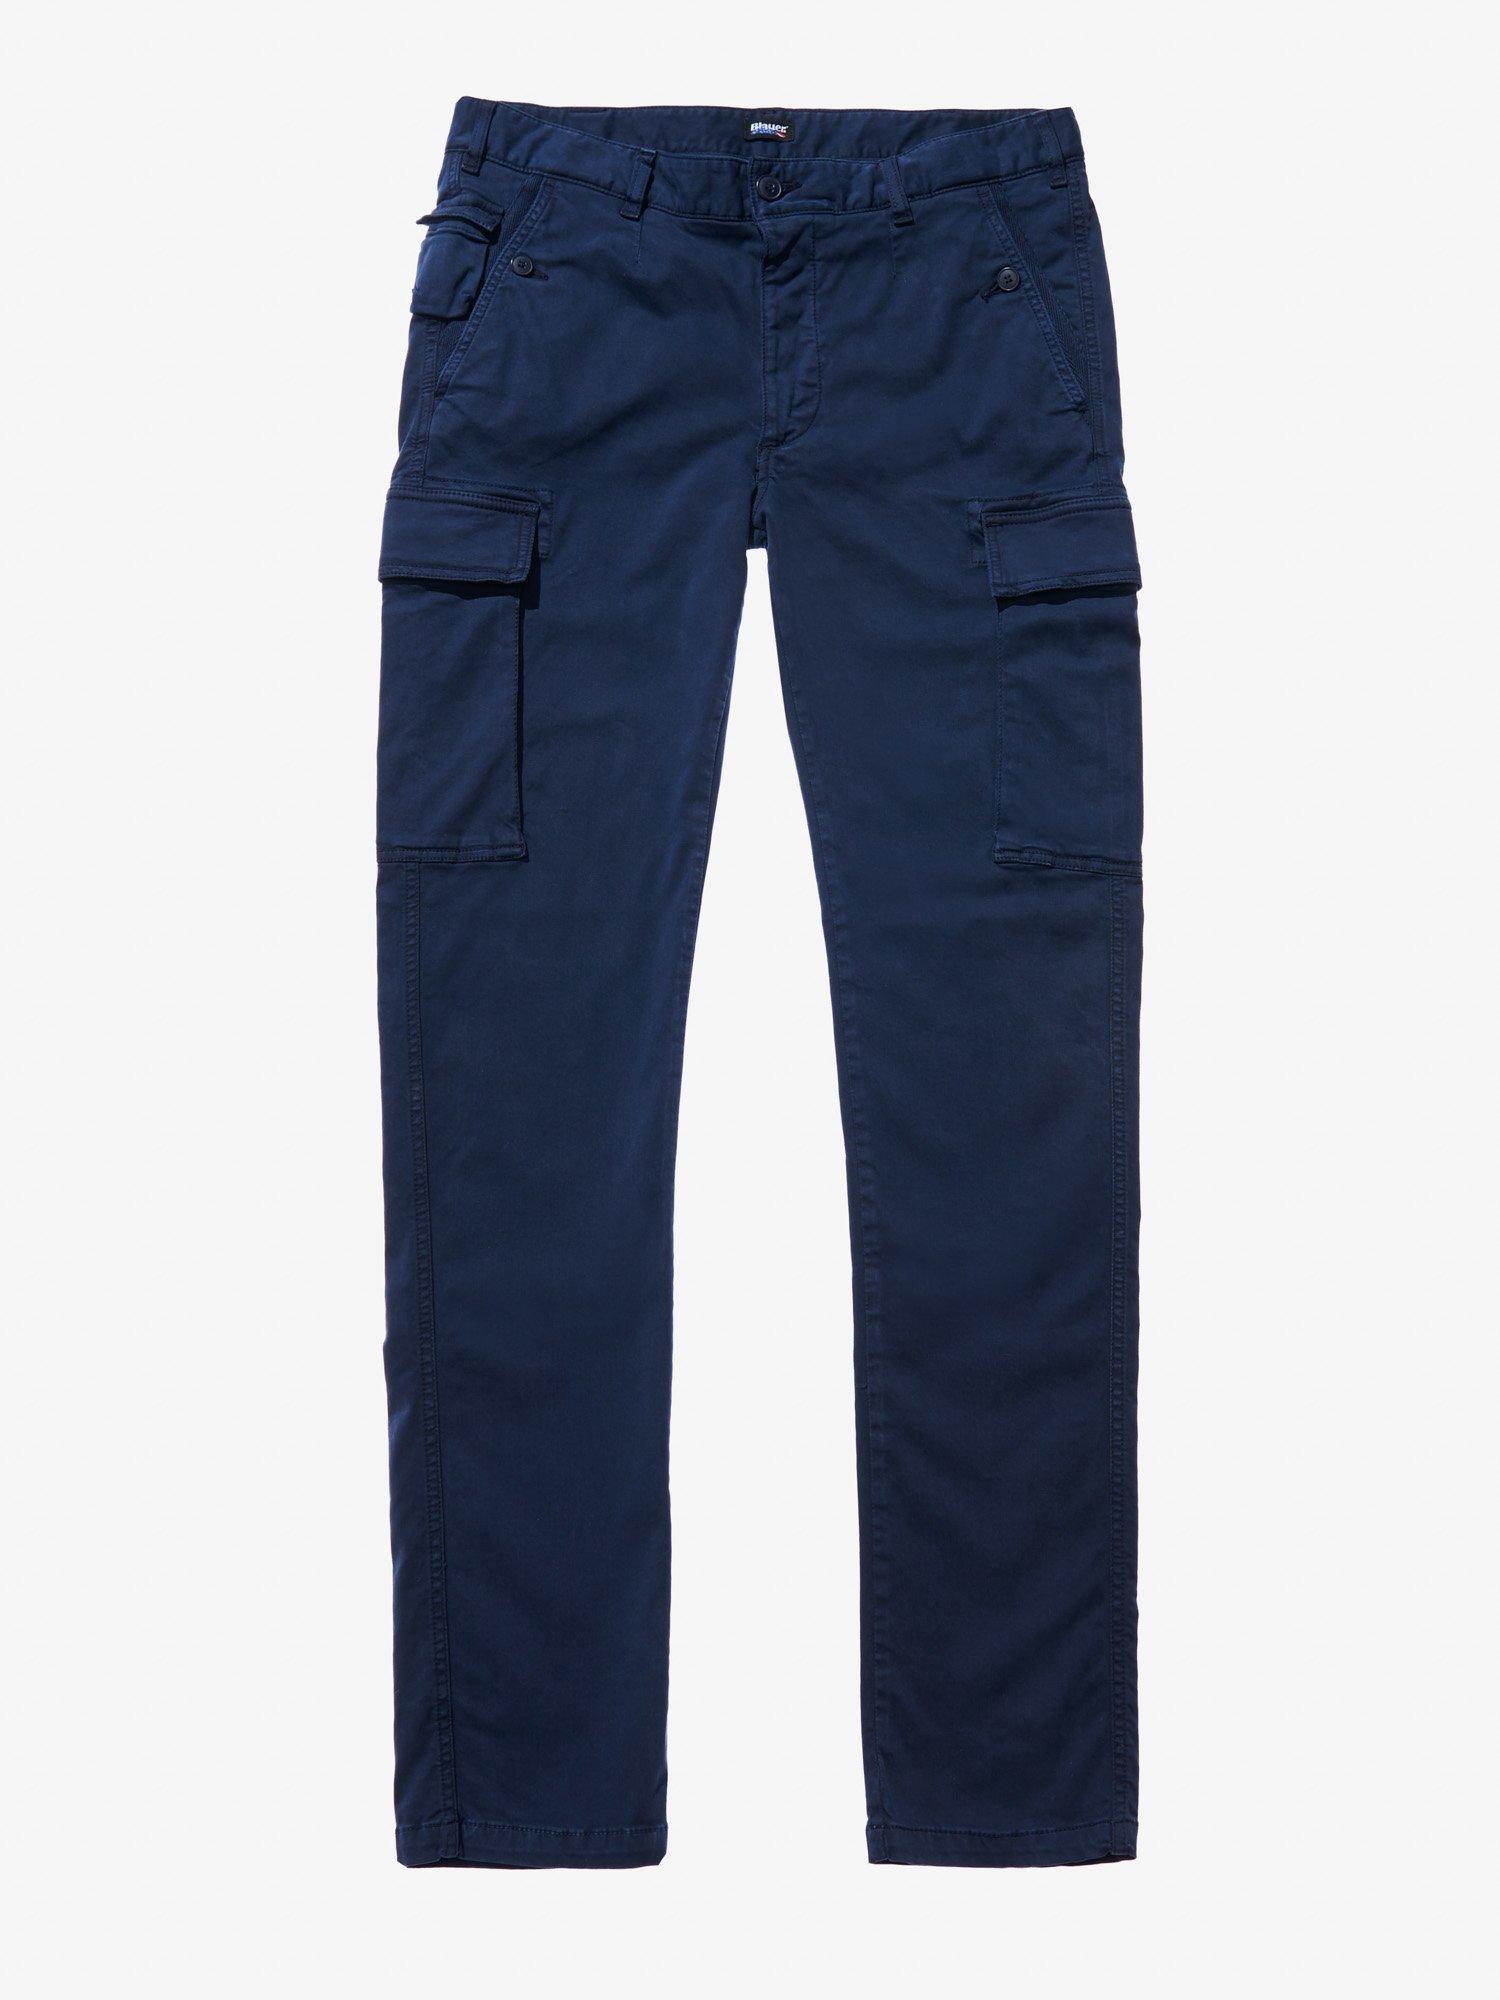 Blauer - CARGO PANTS - blue - Blauer